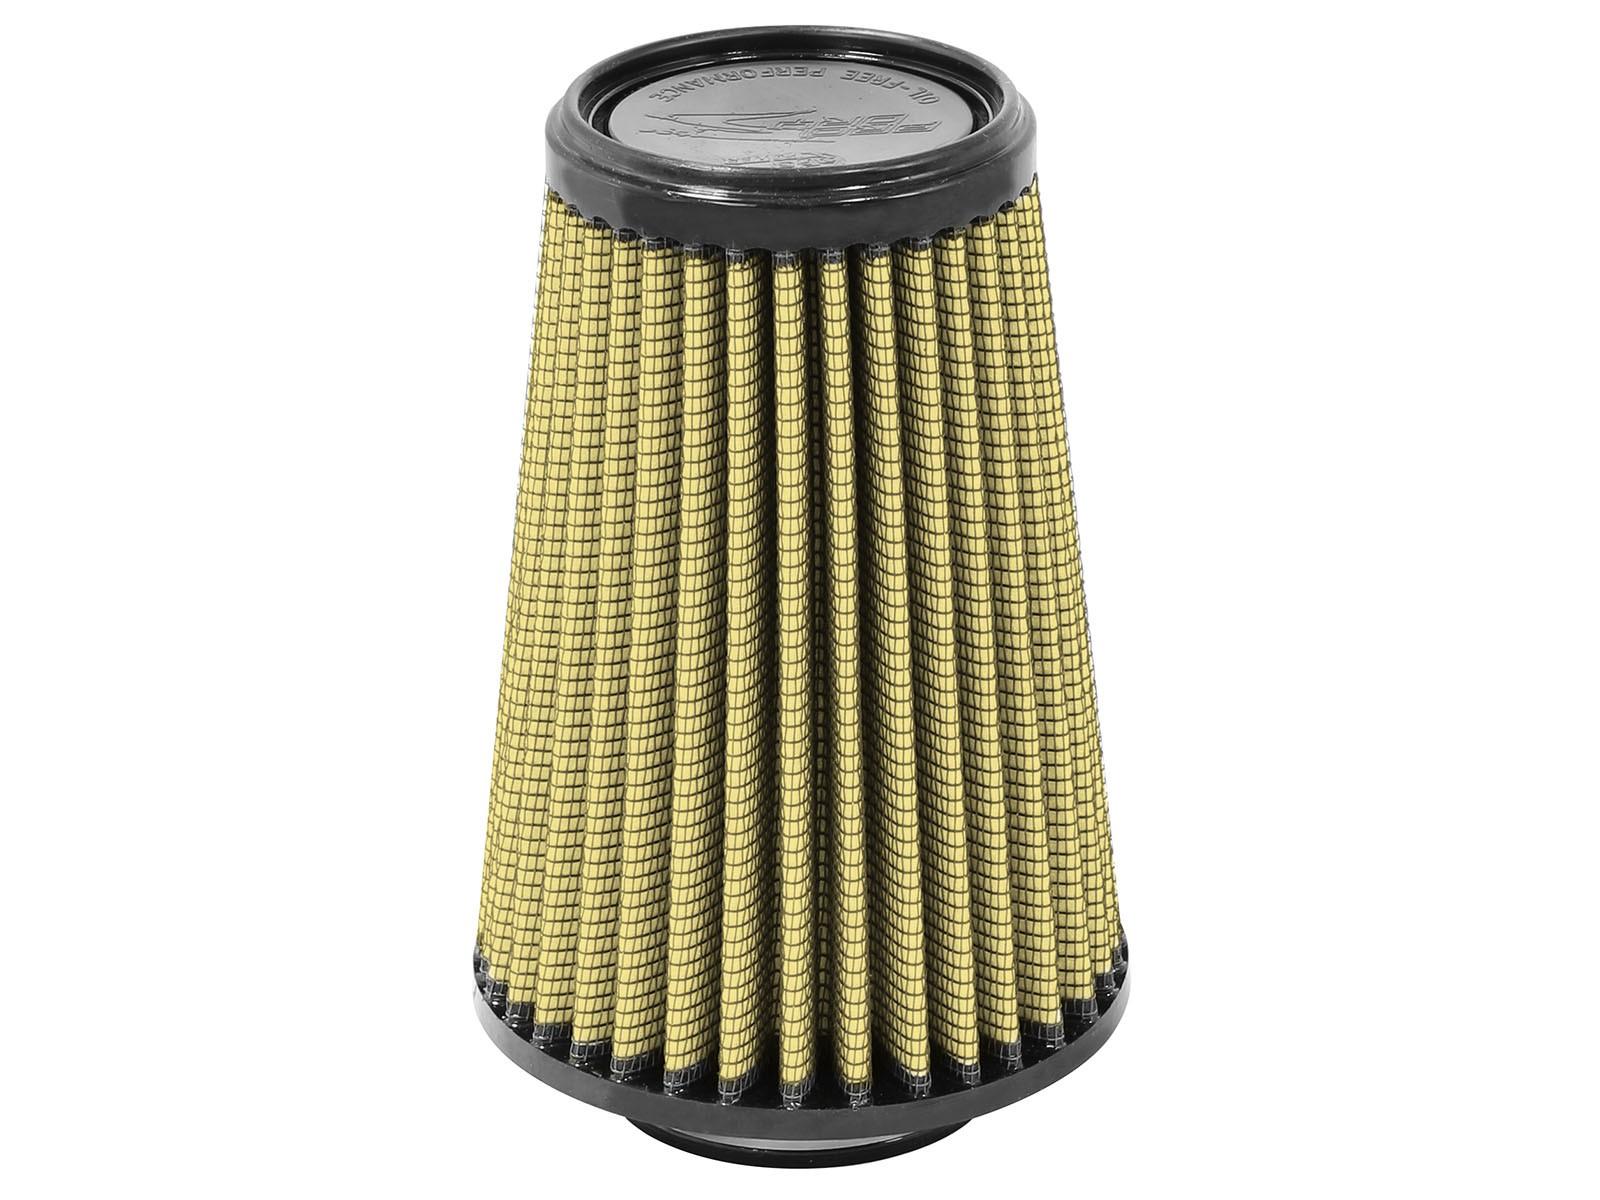 aFe POWER 72-25507 Magnum FLOW Pro GUARD7 Air Filter